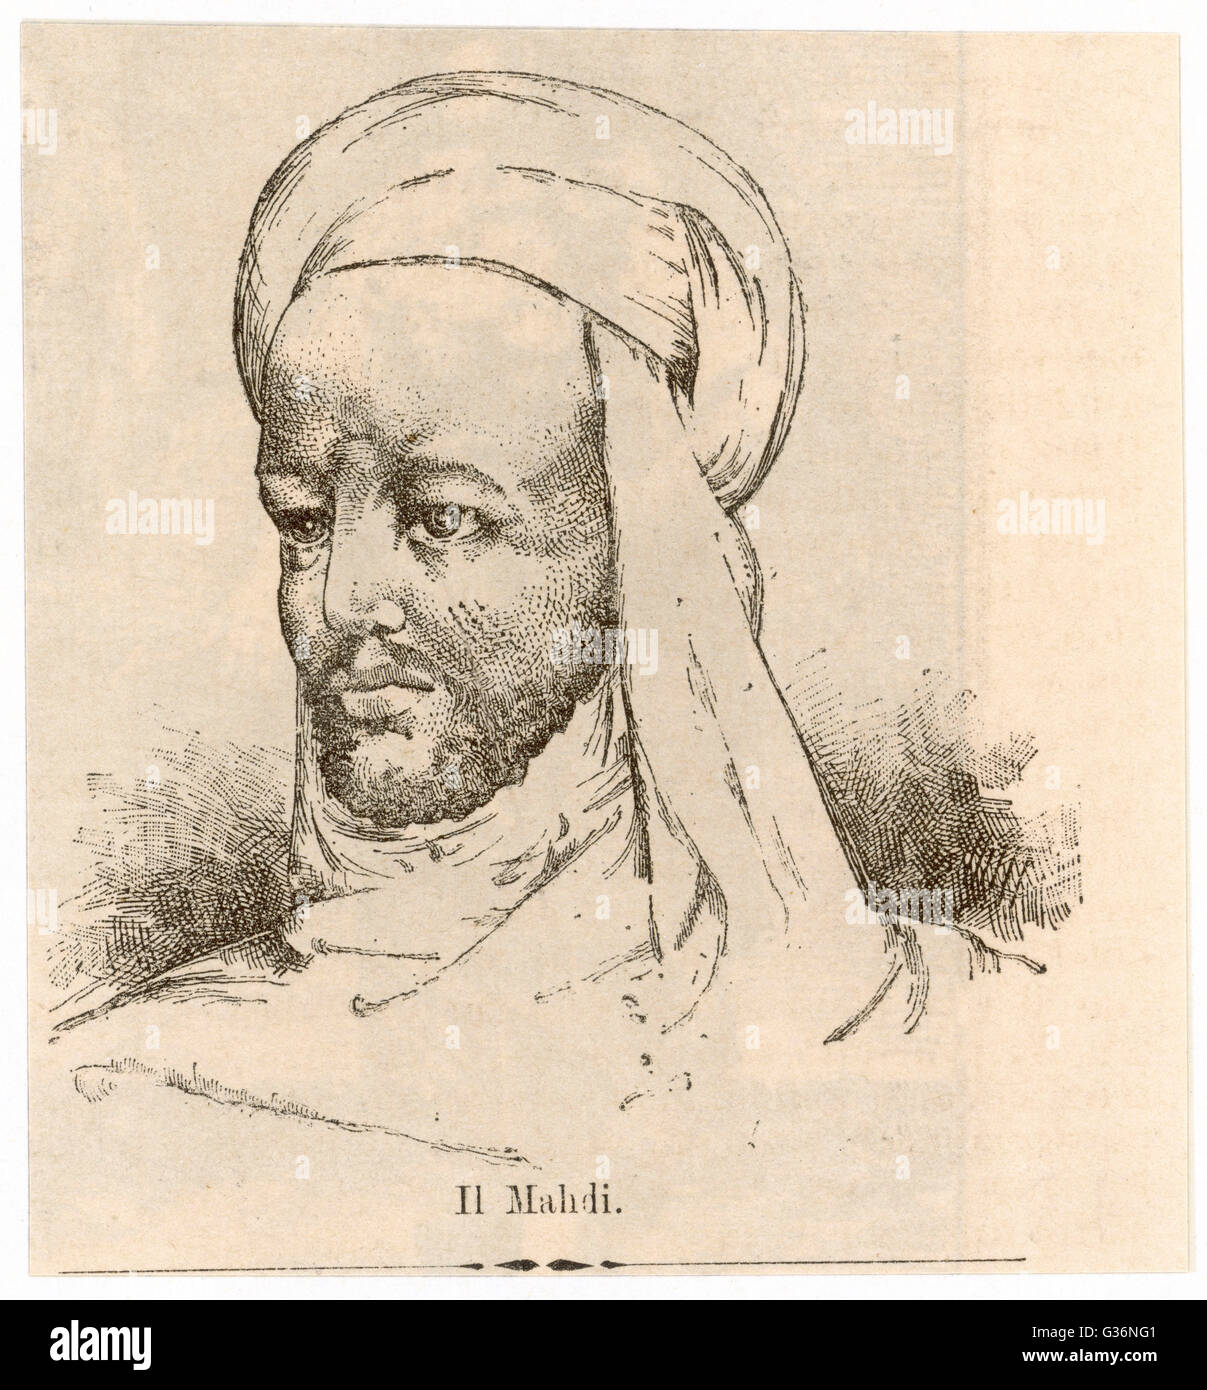 Mohammed Ahmed Muhammad Ahmad Bin Abd Allah 1844 1885 Known As The Mahdi Meaning Messianic Redeemer Of Islamic Faith A Sufi Sheikh